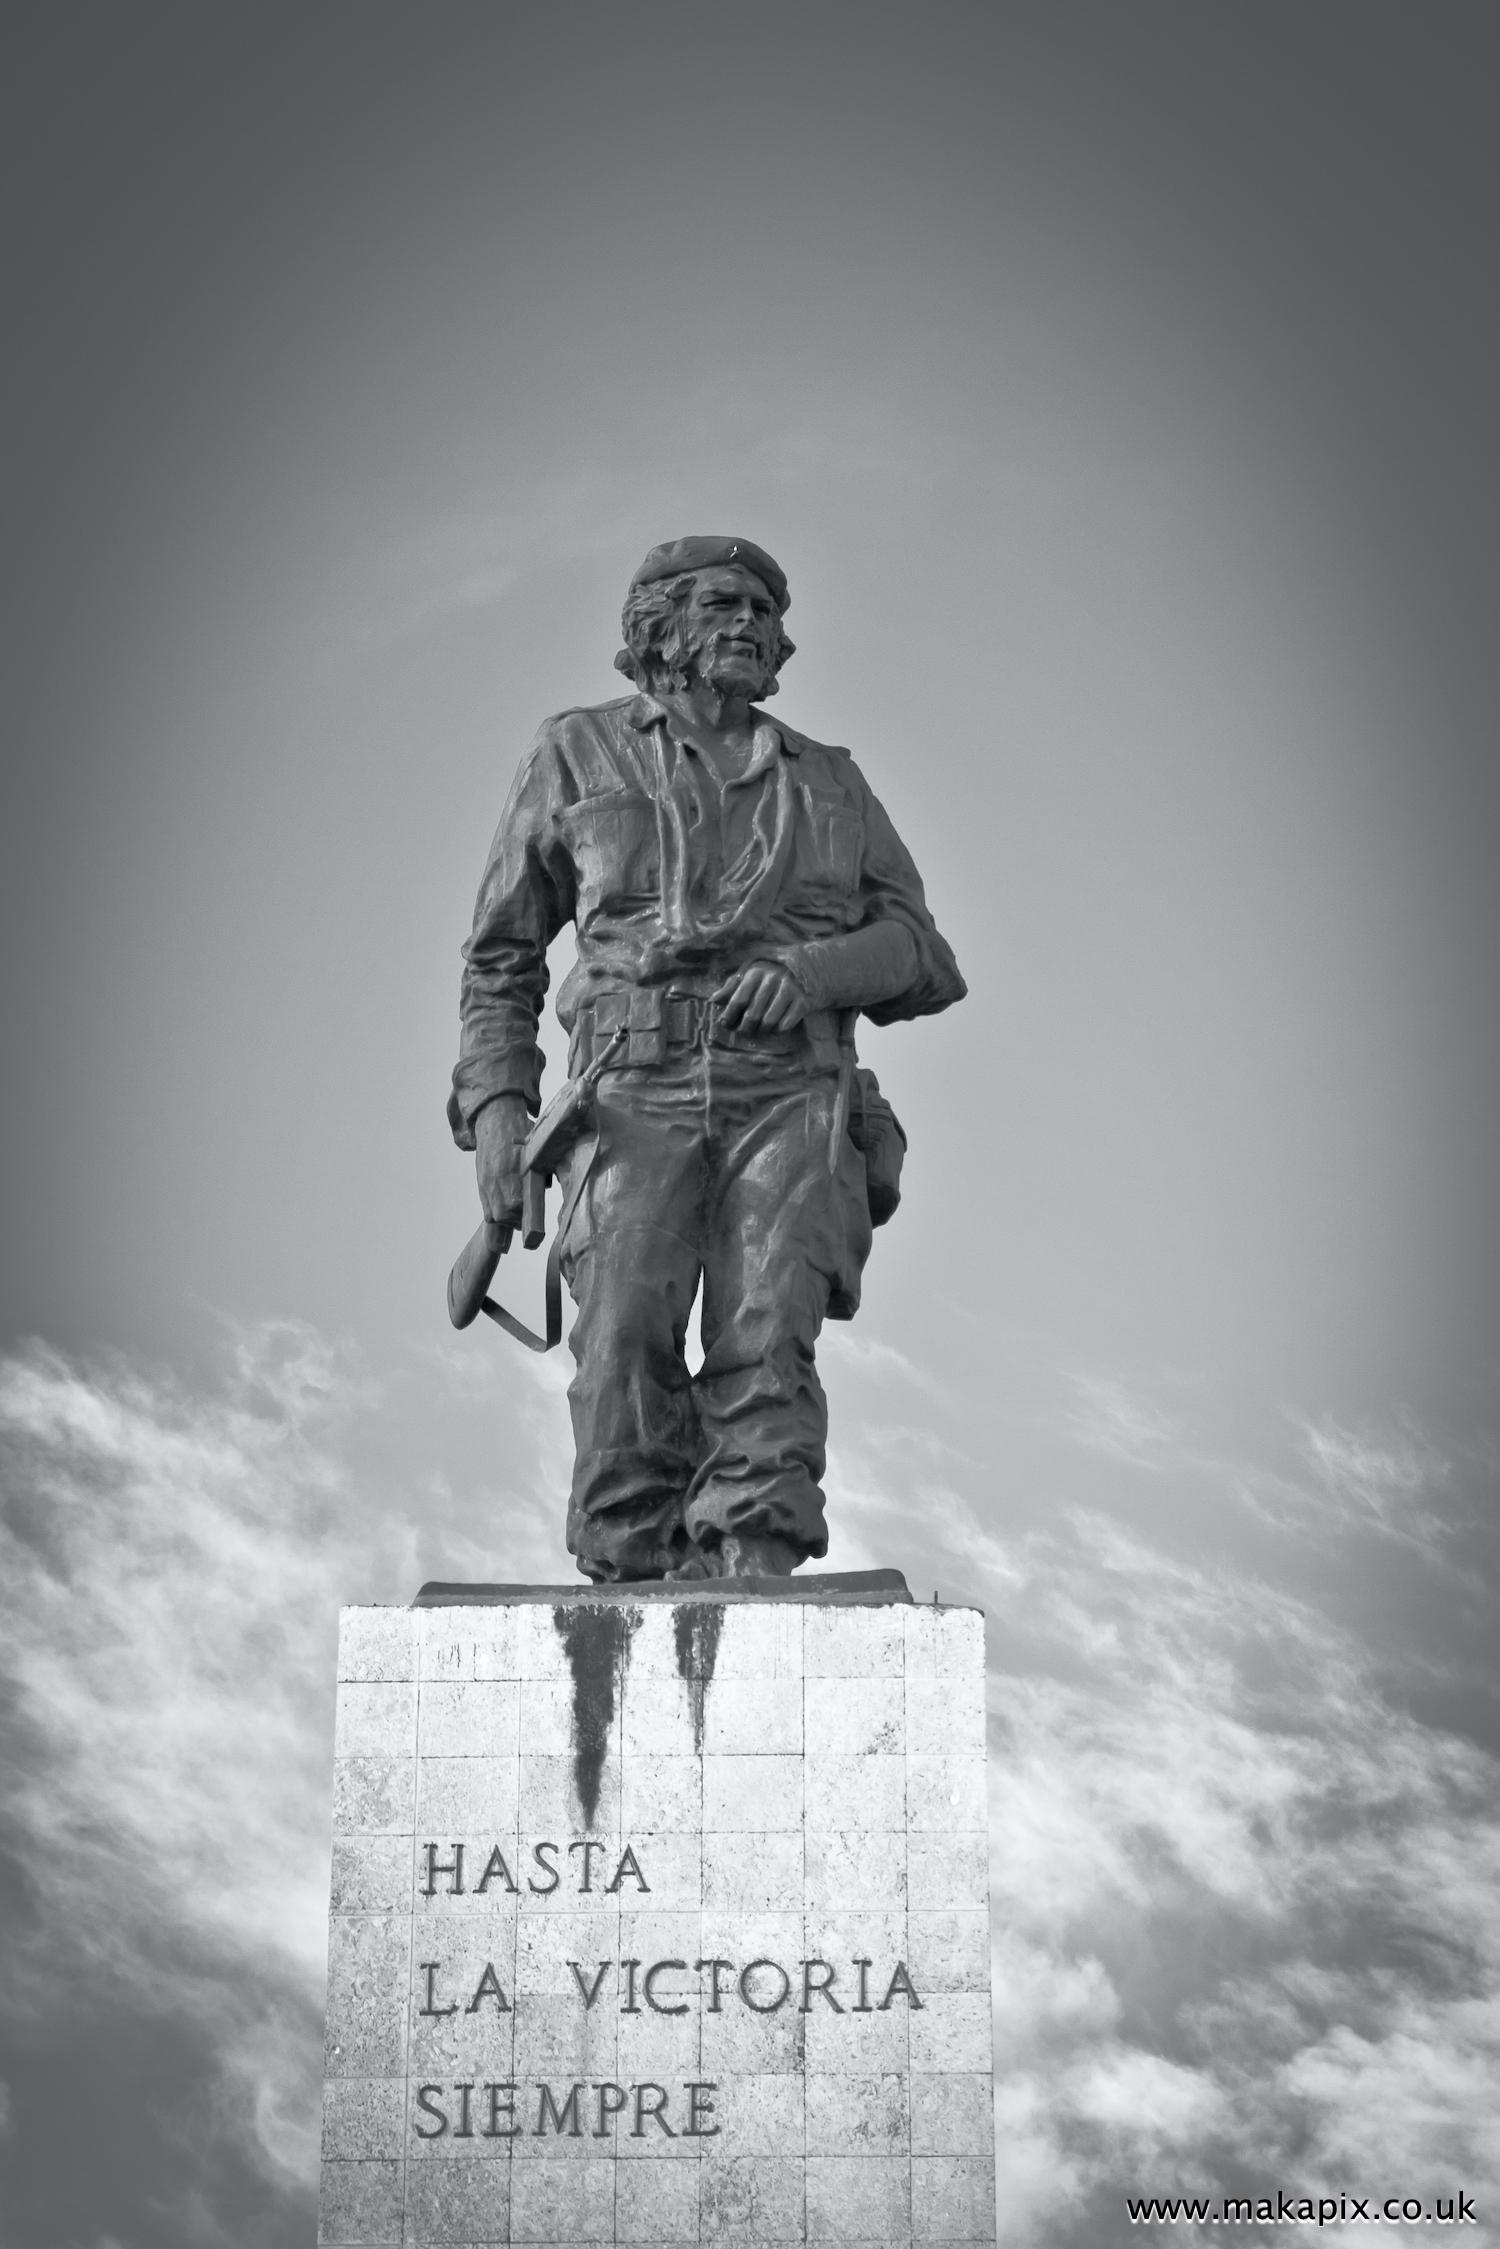 Che Guevara's Monument and Mausoleum, Santa Clara, Cuba